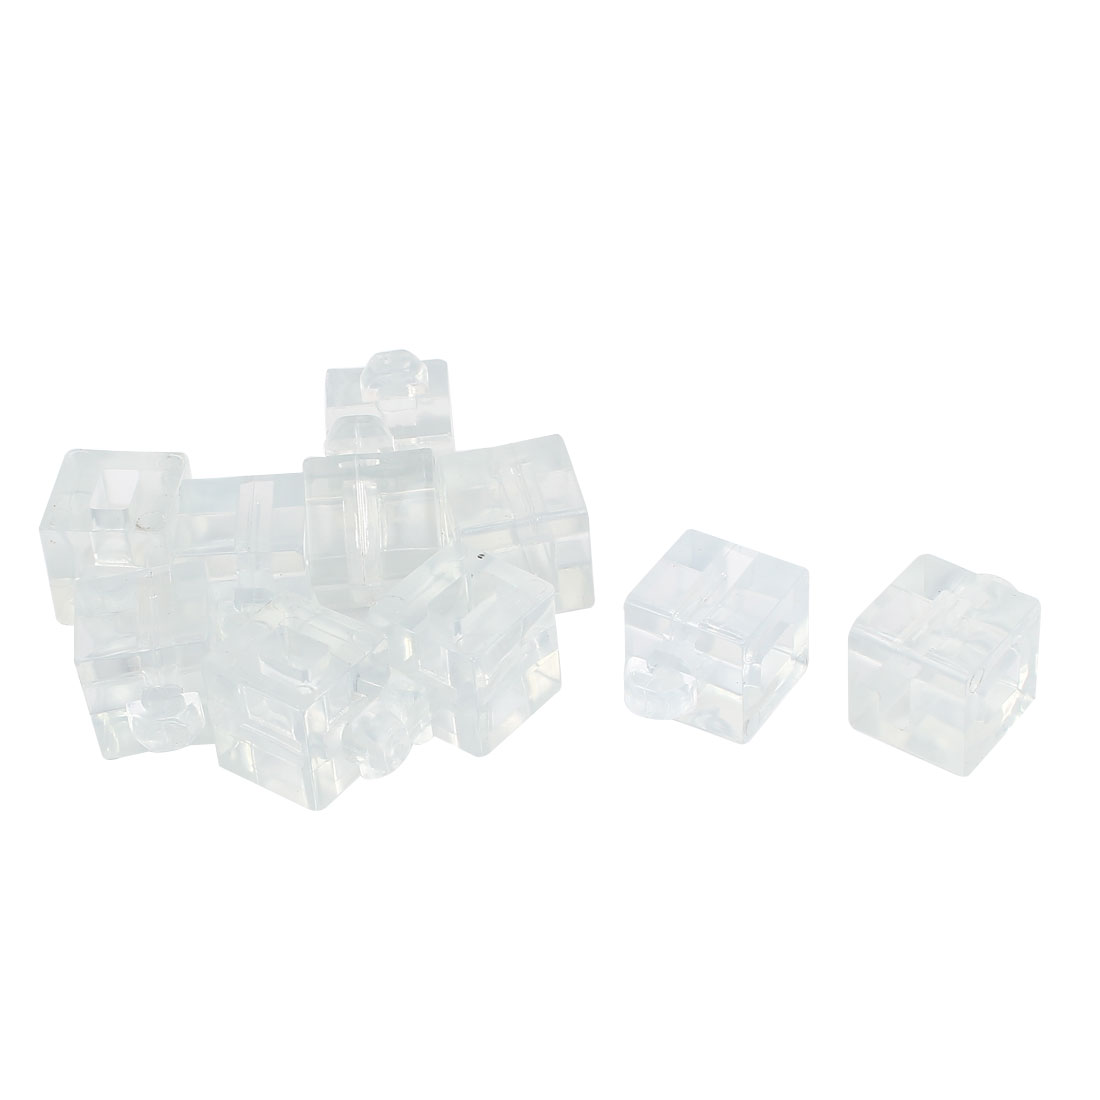 30 Series Aluminum Profile Spacer Fastener Block Connector Clear 10pcs